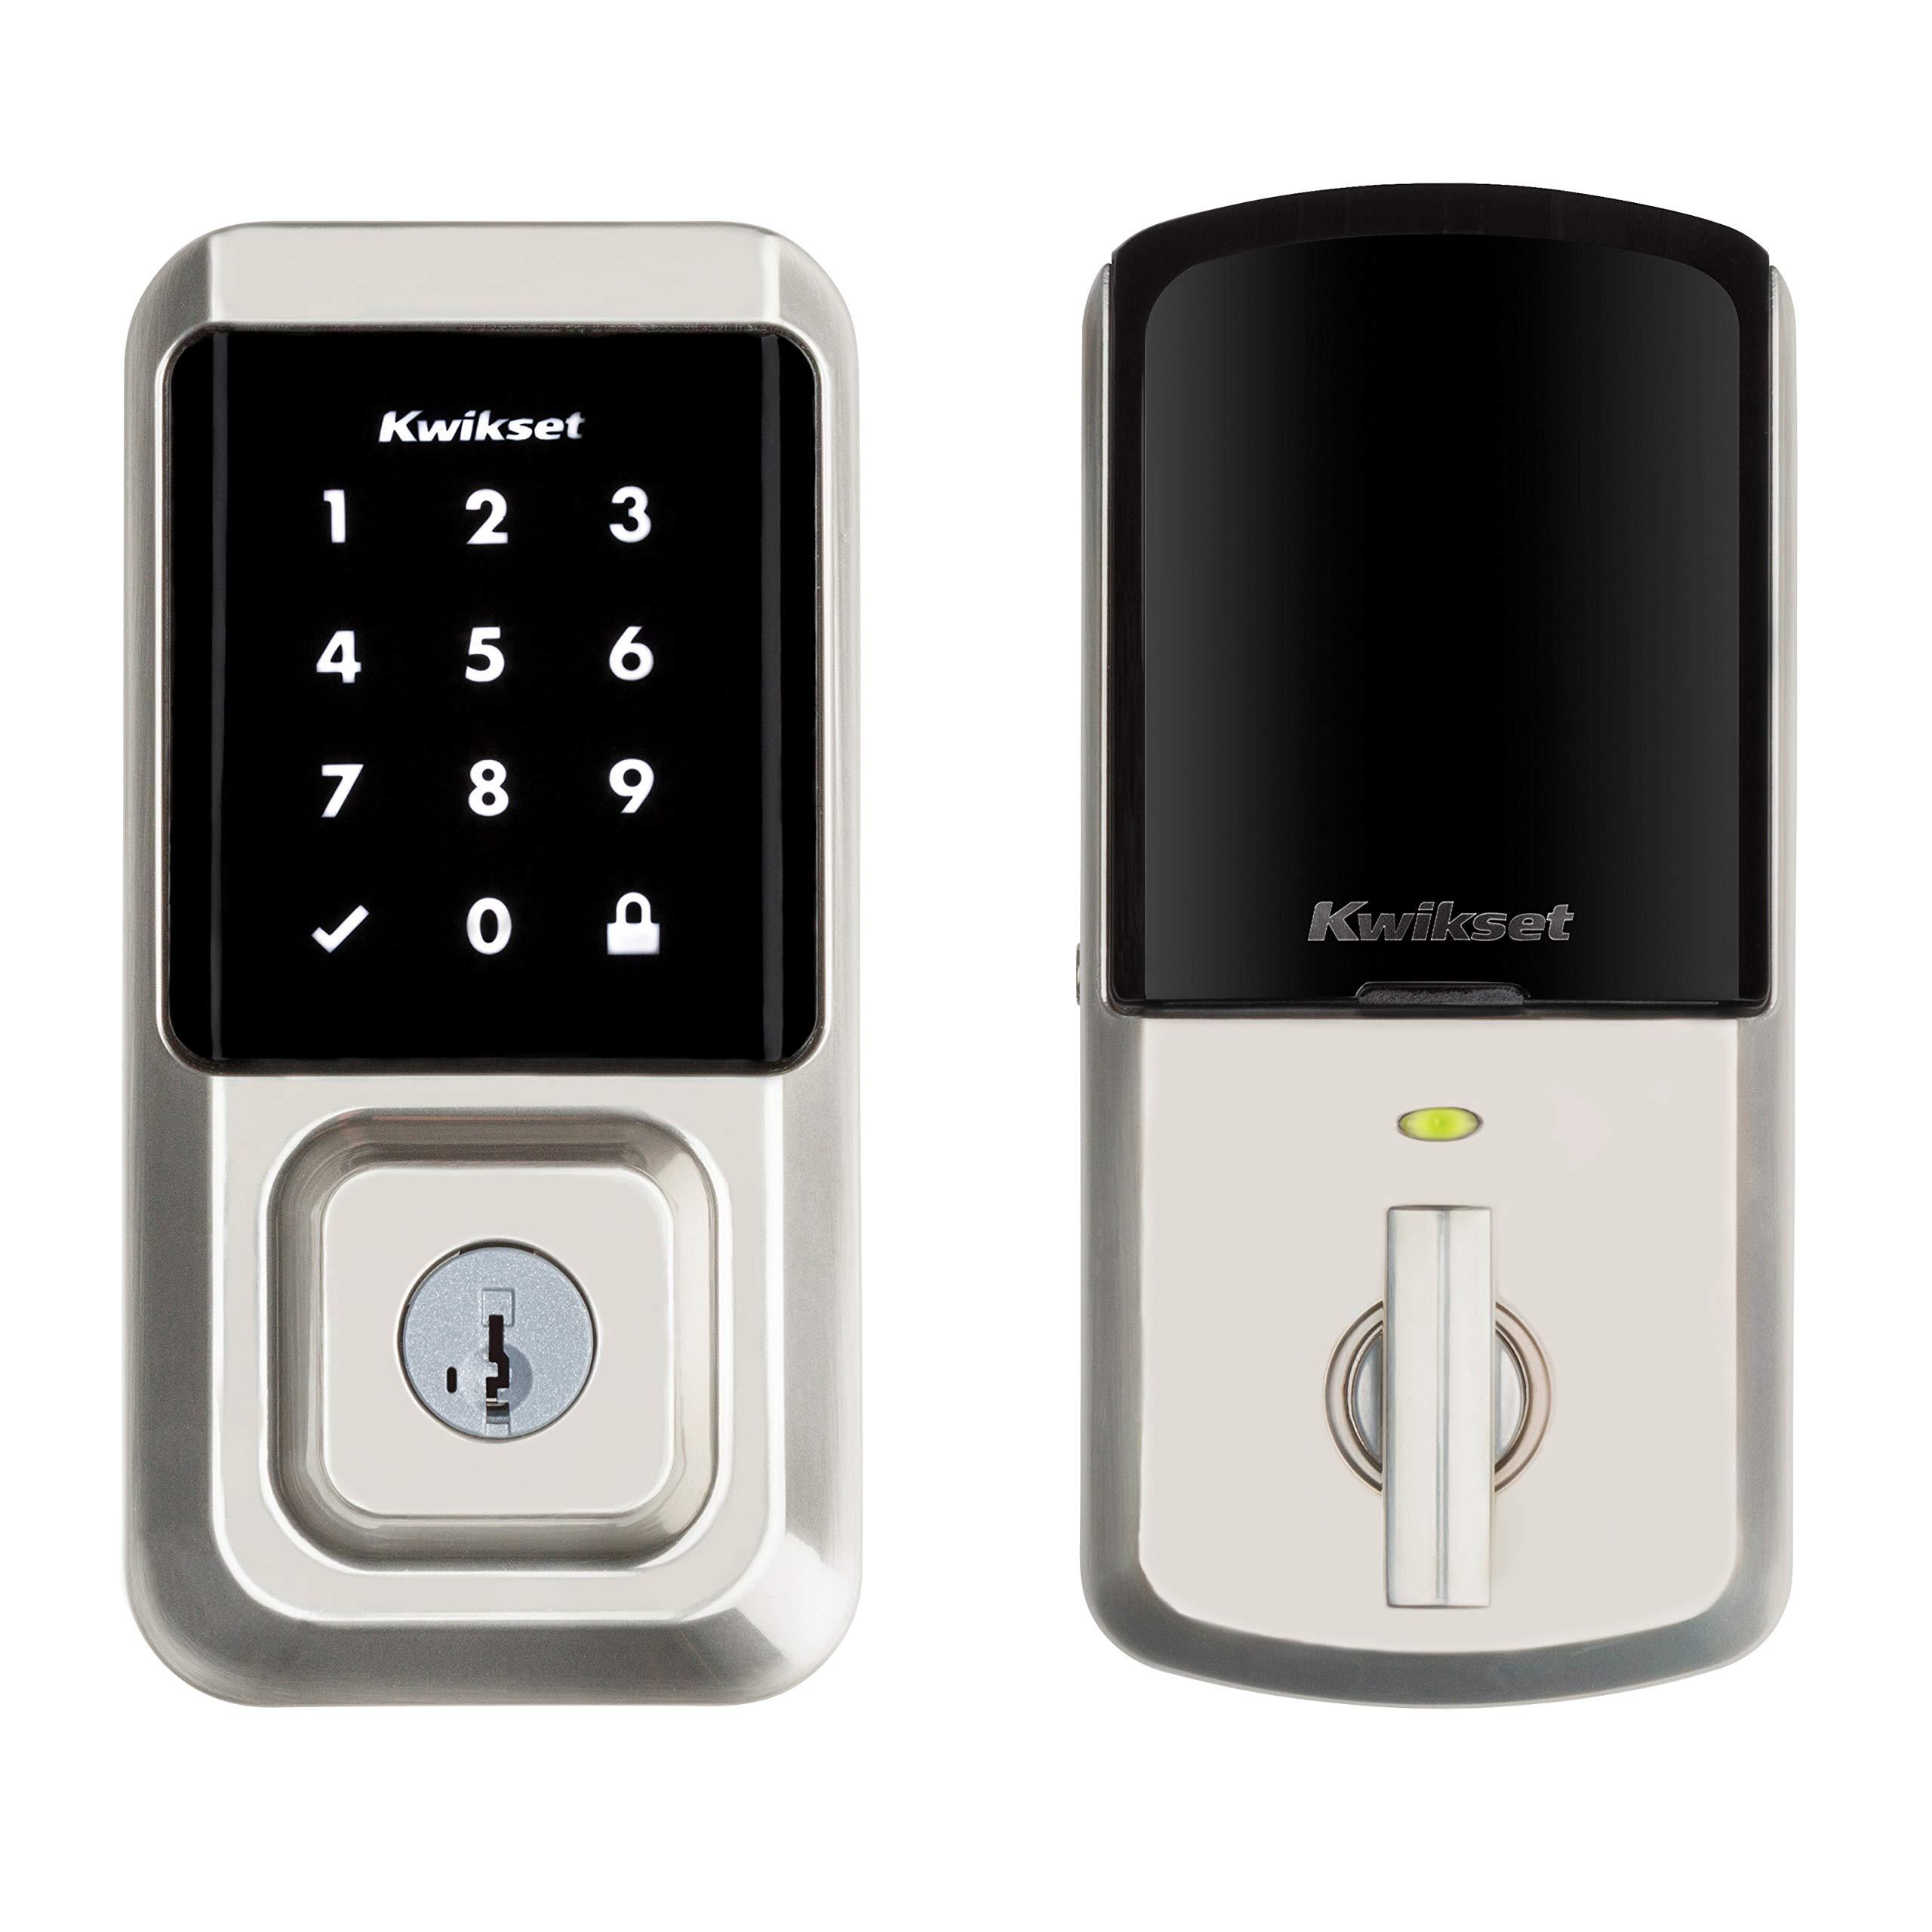 Kwikset 99390 001 Electronic Touchscreen Featuring